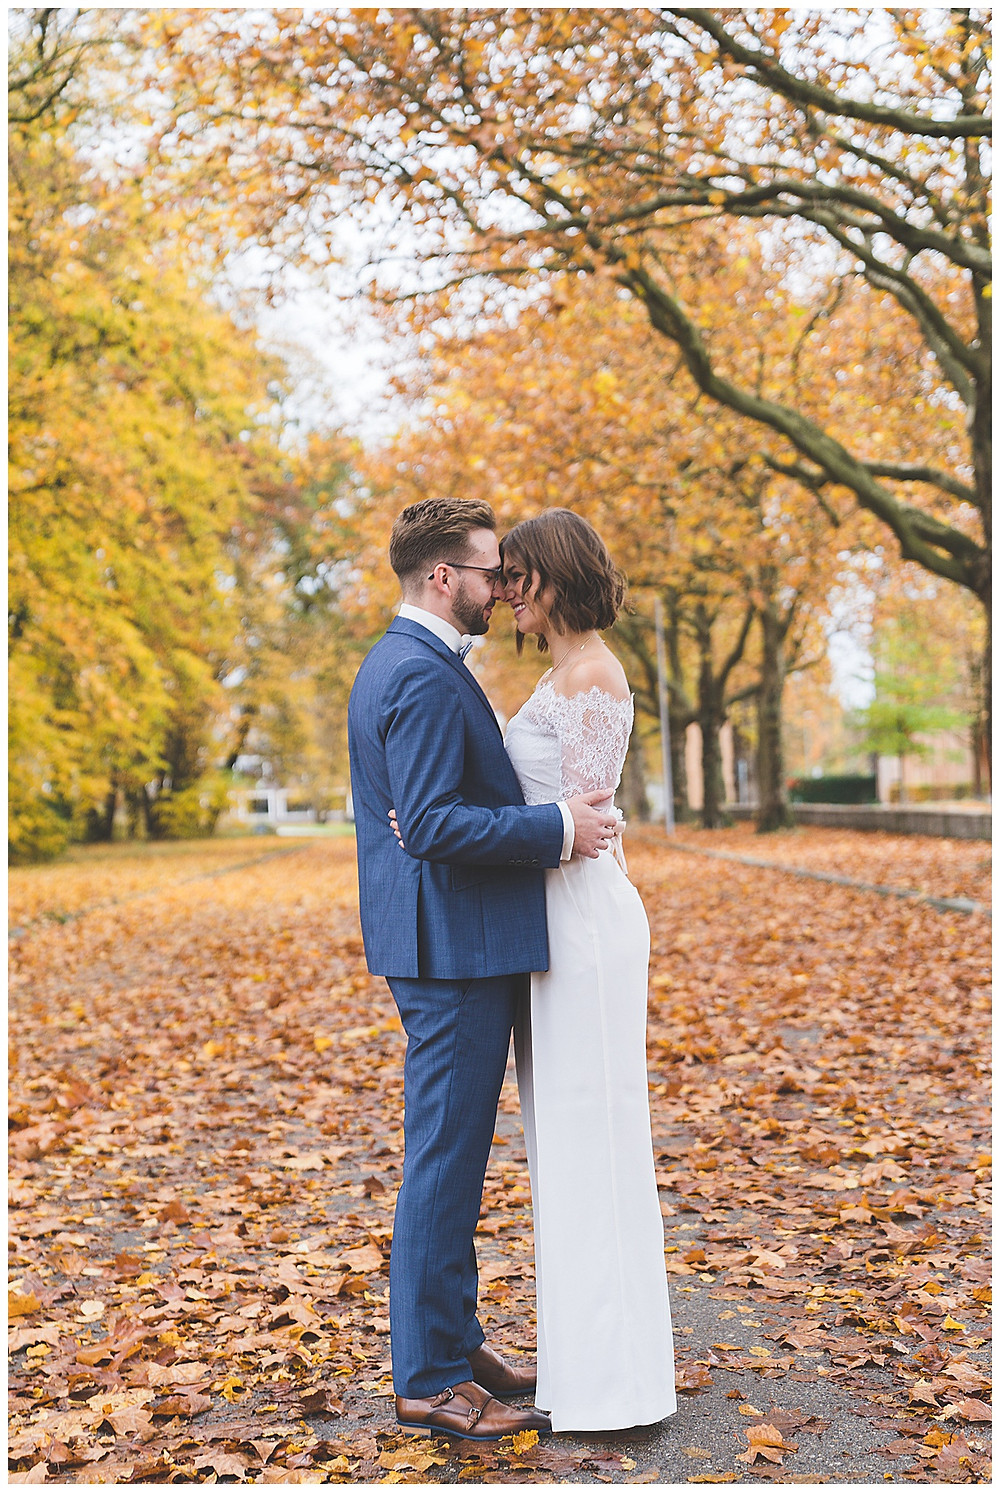 Brautpaar im Herbstlaub